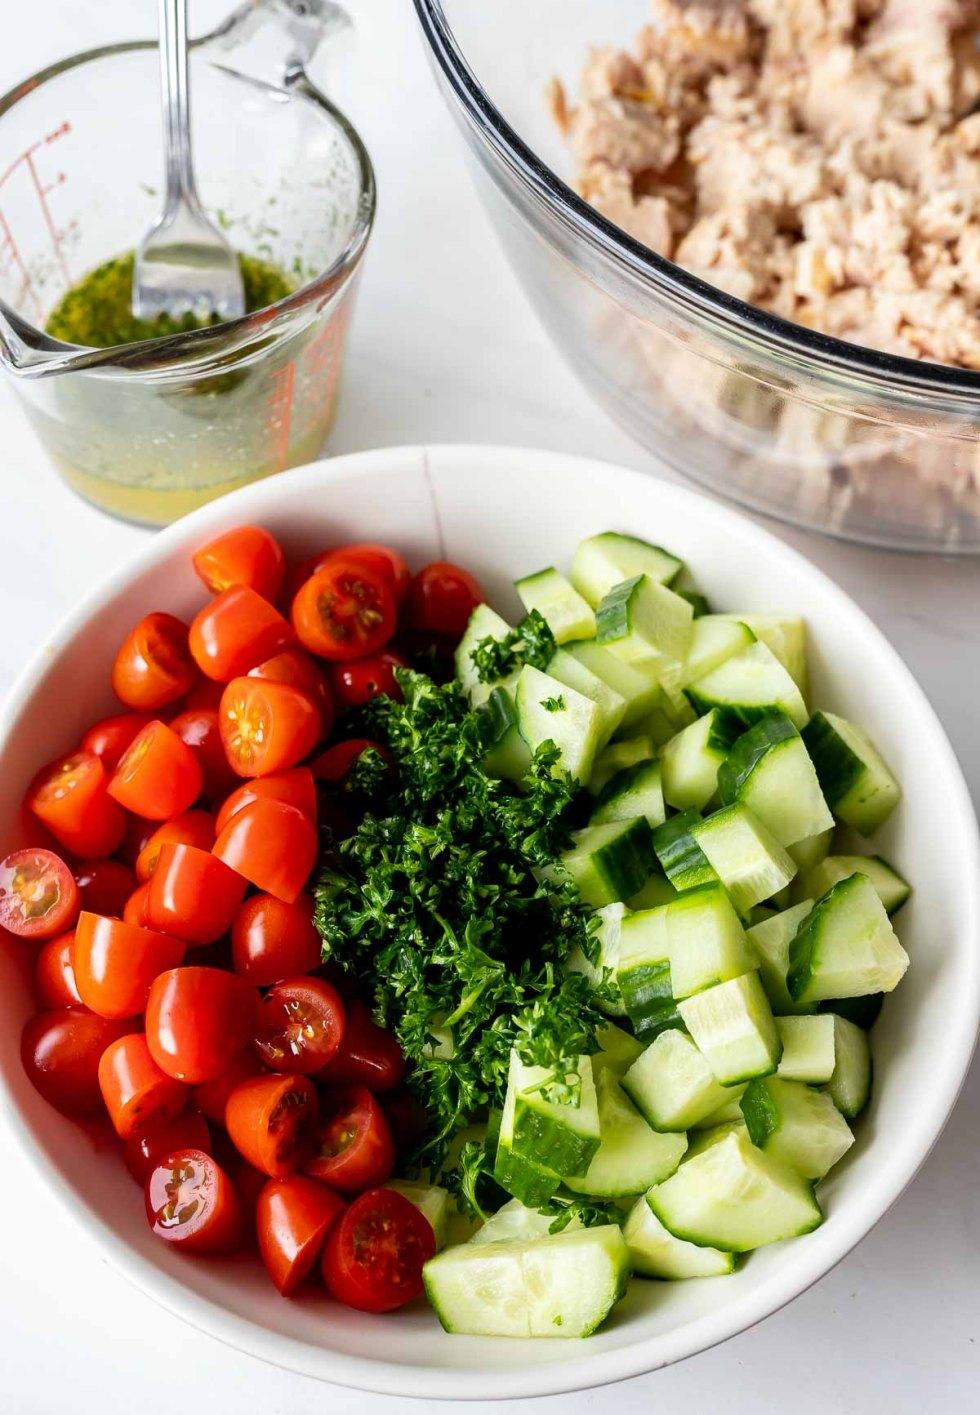 tuna salad ingredients in white bowl